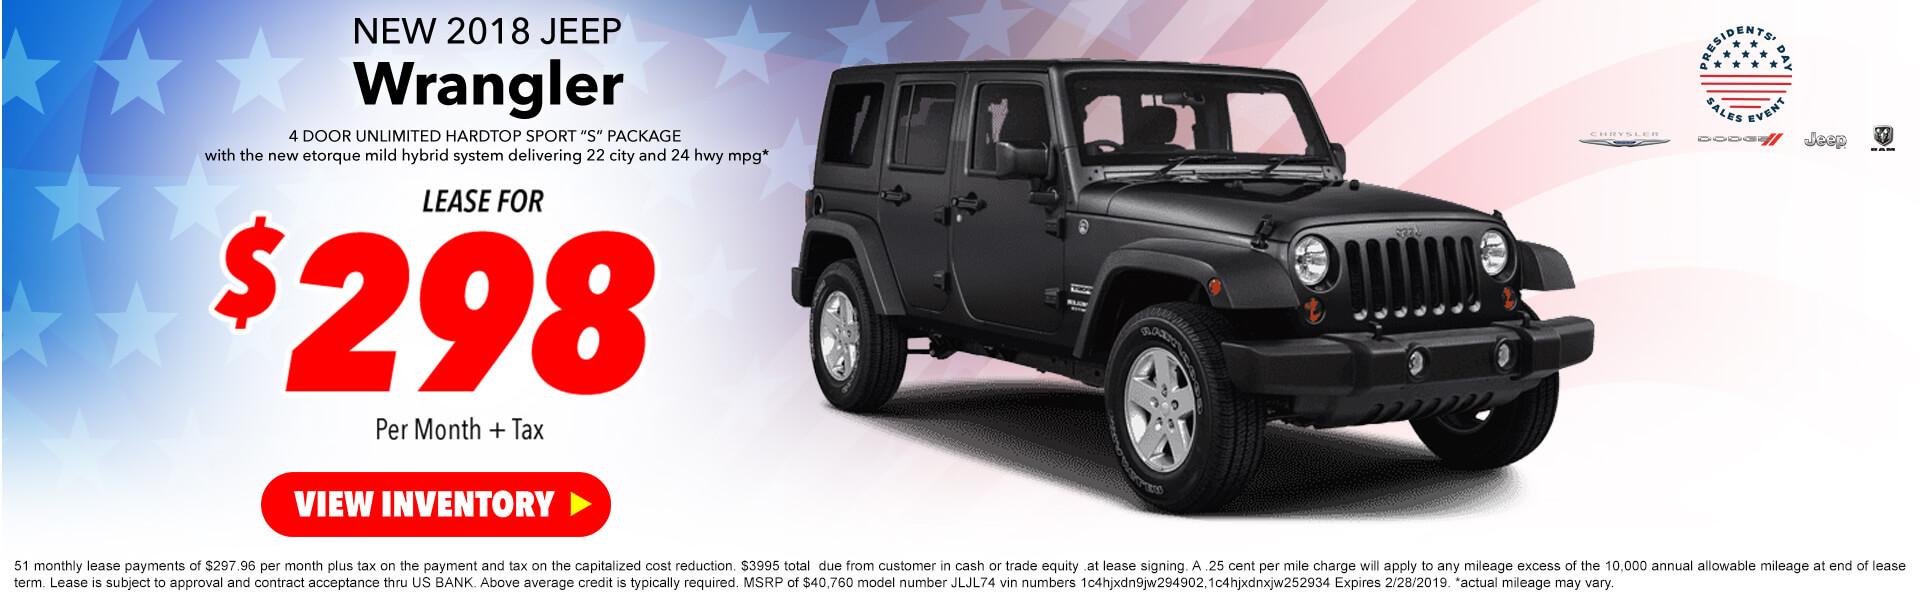 Jeep Wrangler UNL Sport